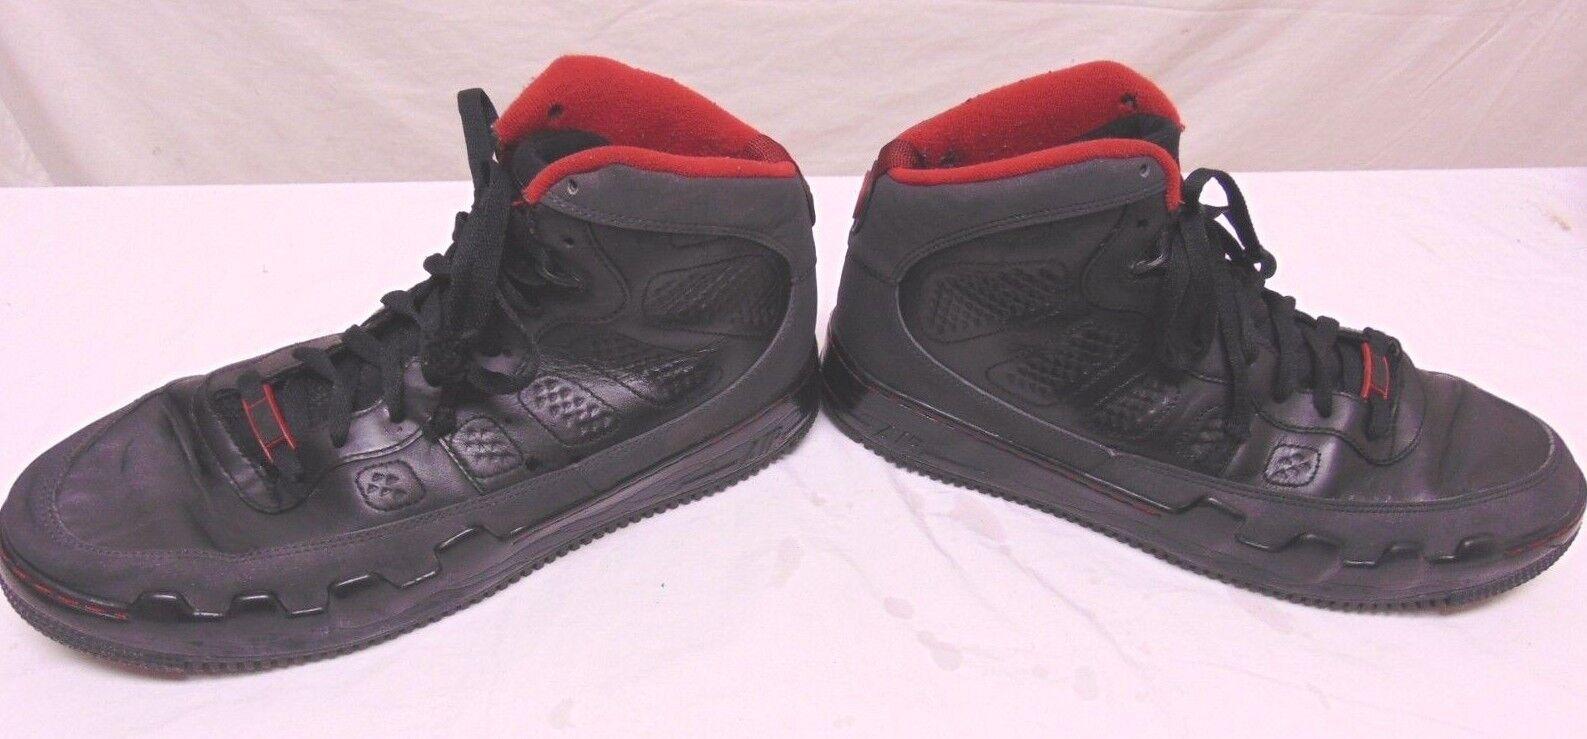 Nike Air Jordan IX 9 Retro Black Red Dark Charcoal 2009 352753-061 Size 12